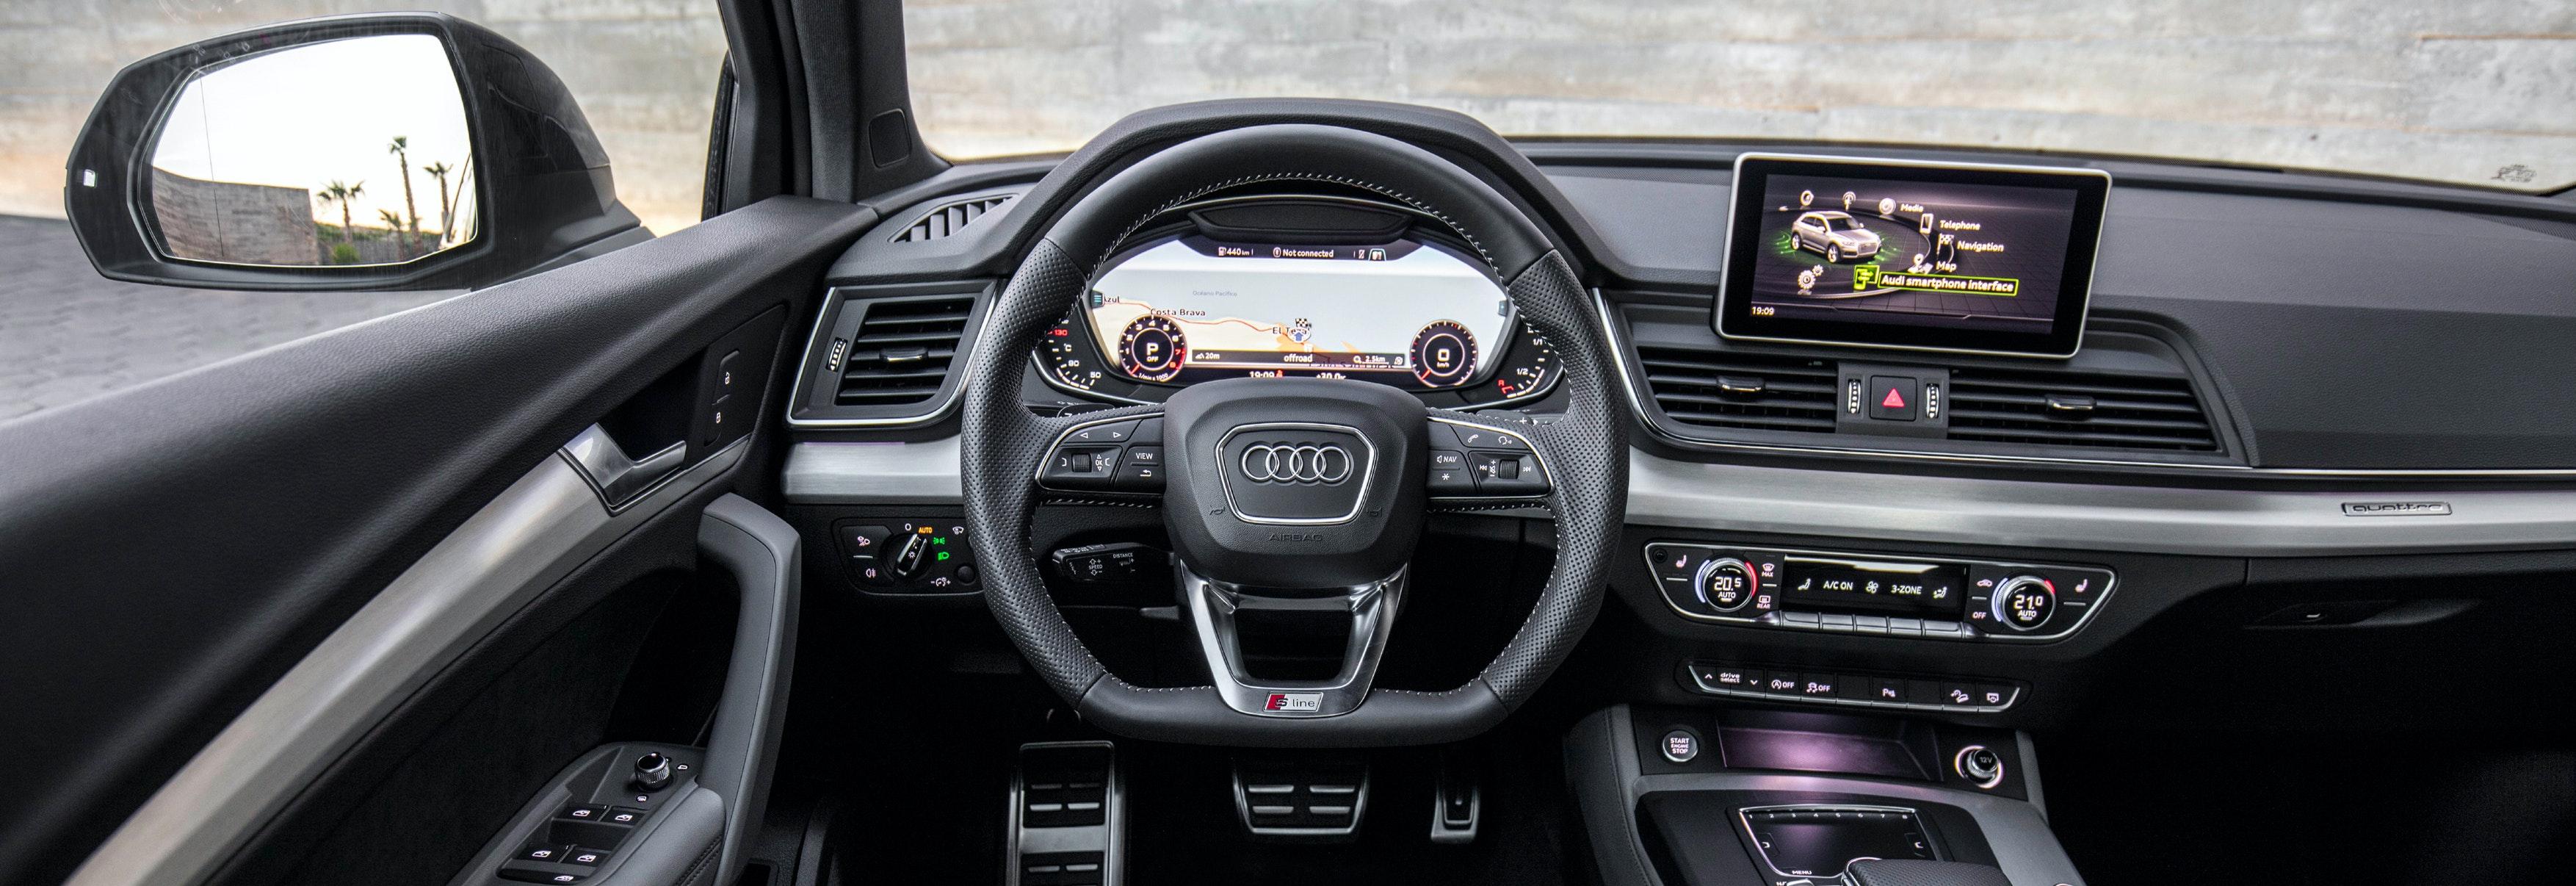 Jaguar F Pace Exterior >> Audi Q5 dimensions guide – UK exterior and interior sizes | carwow